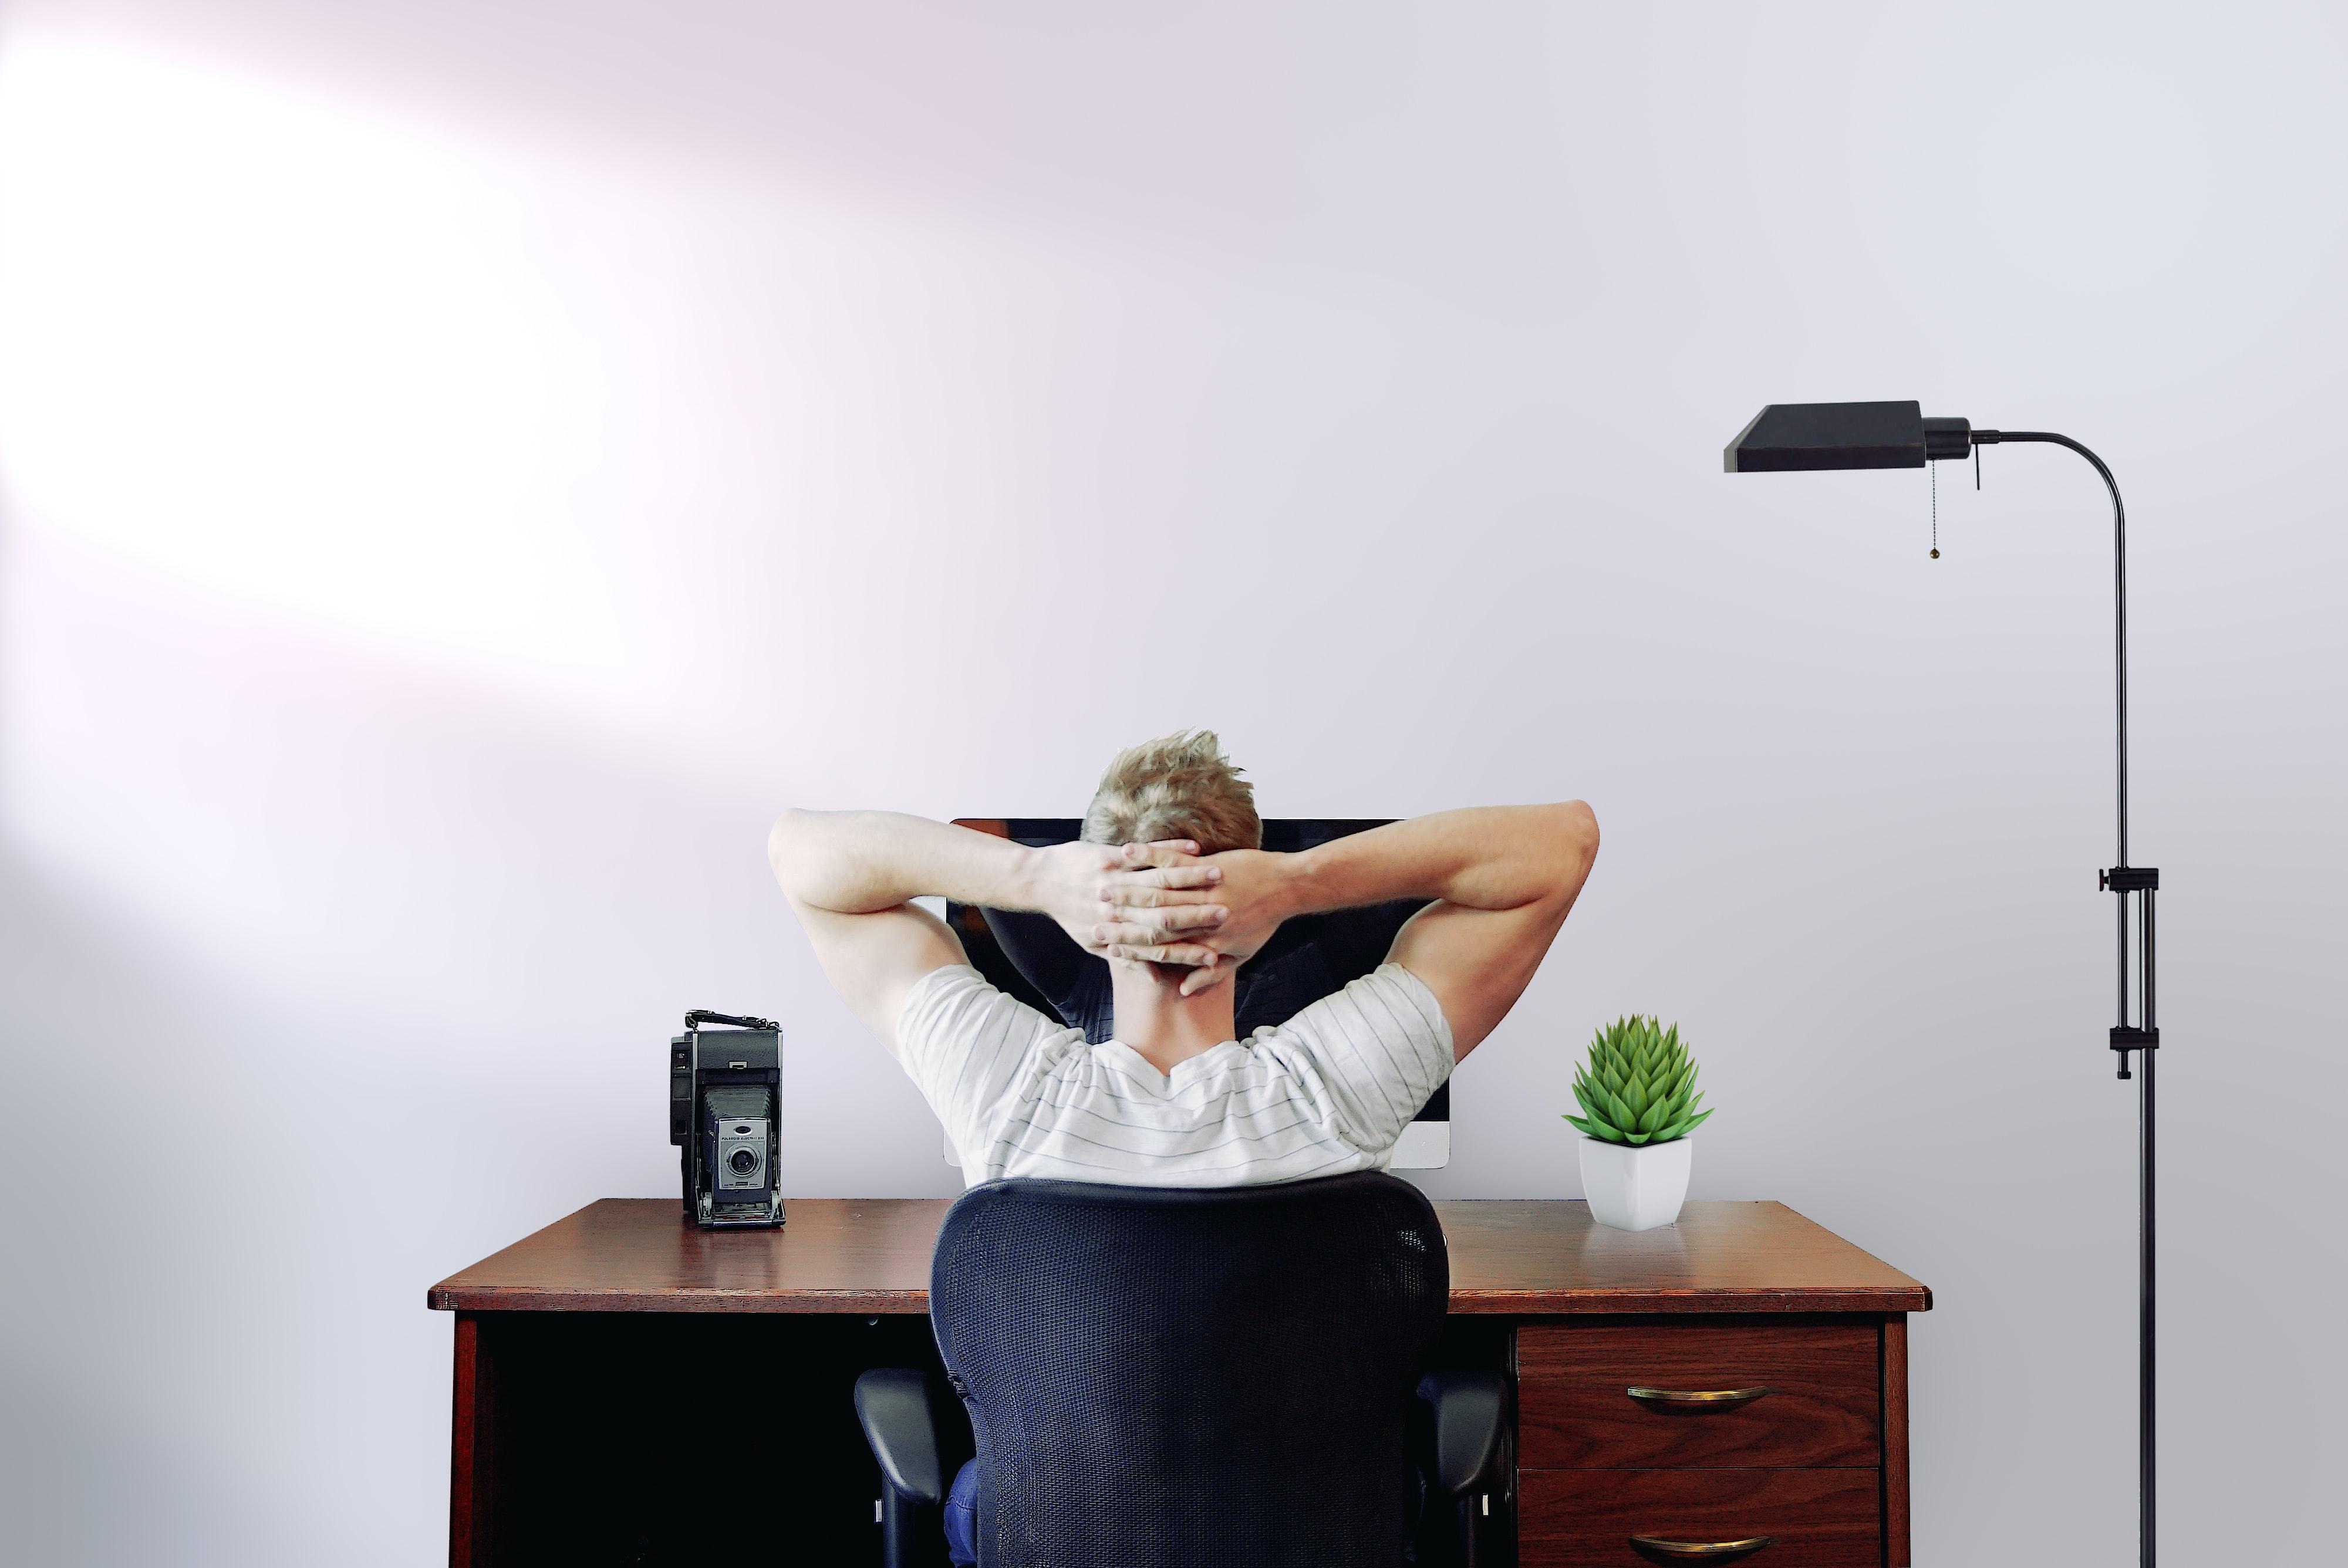 disadvantages of freelance writing